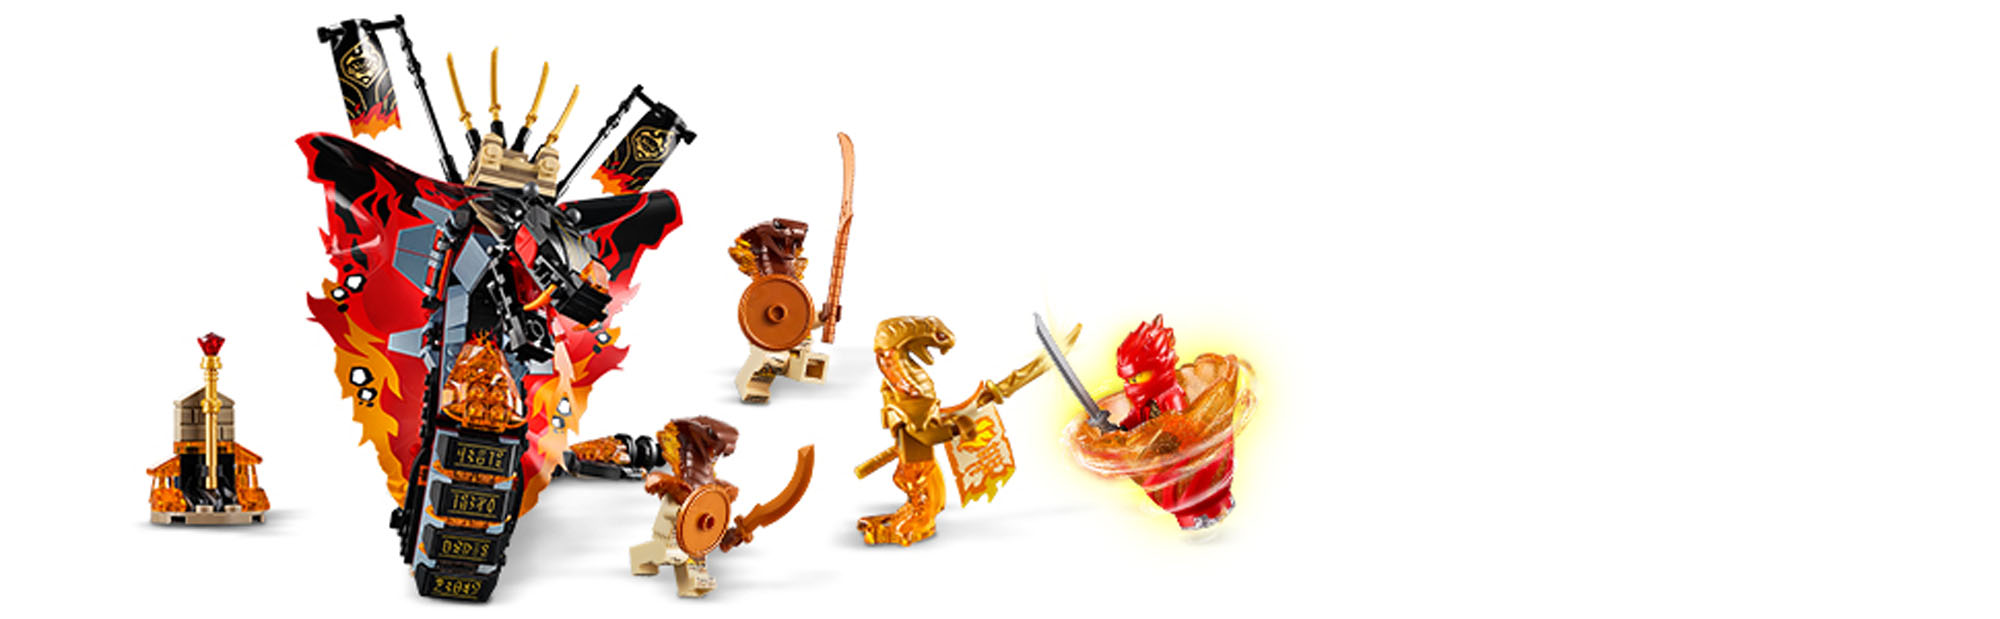 lego ninjago masters of spinjitzu instructions